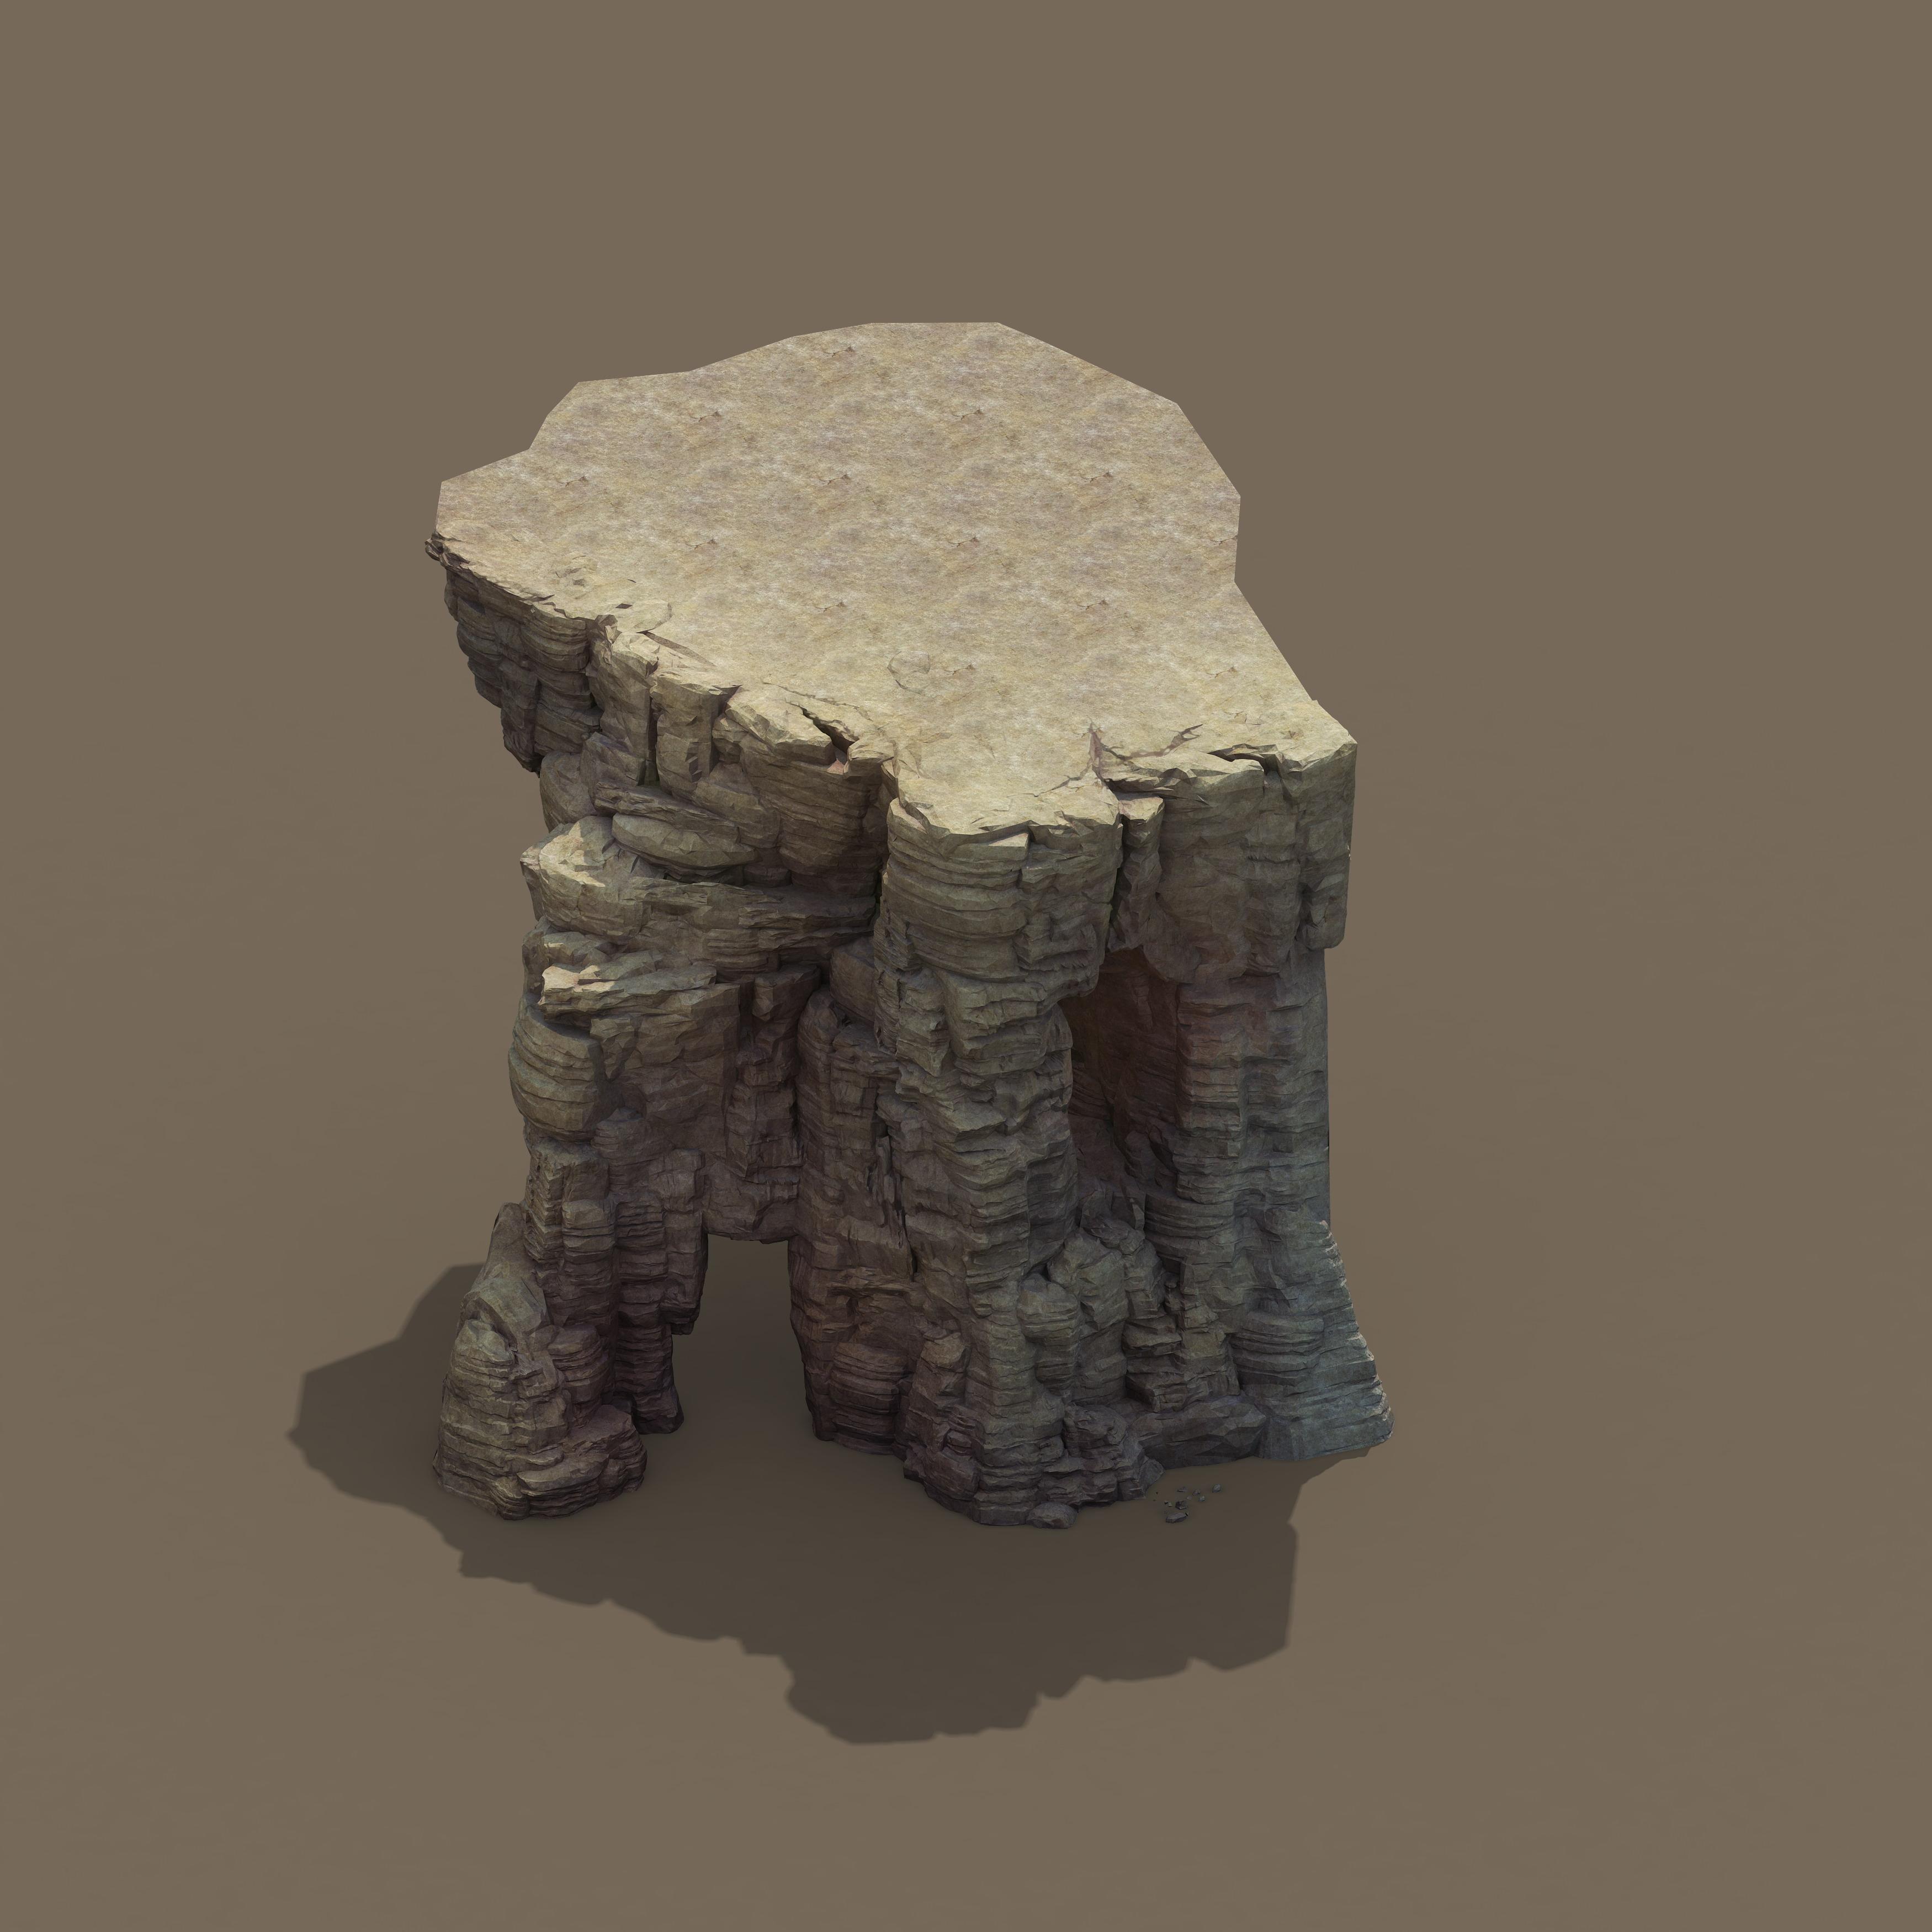 Mountain - Terrain 05